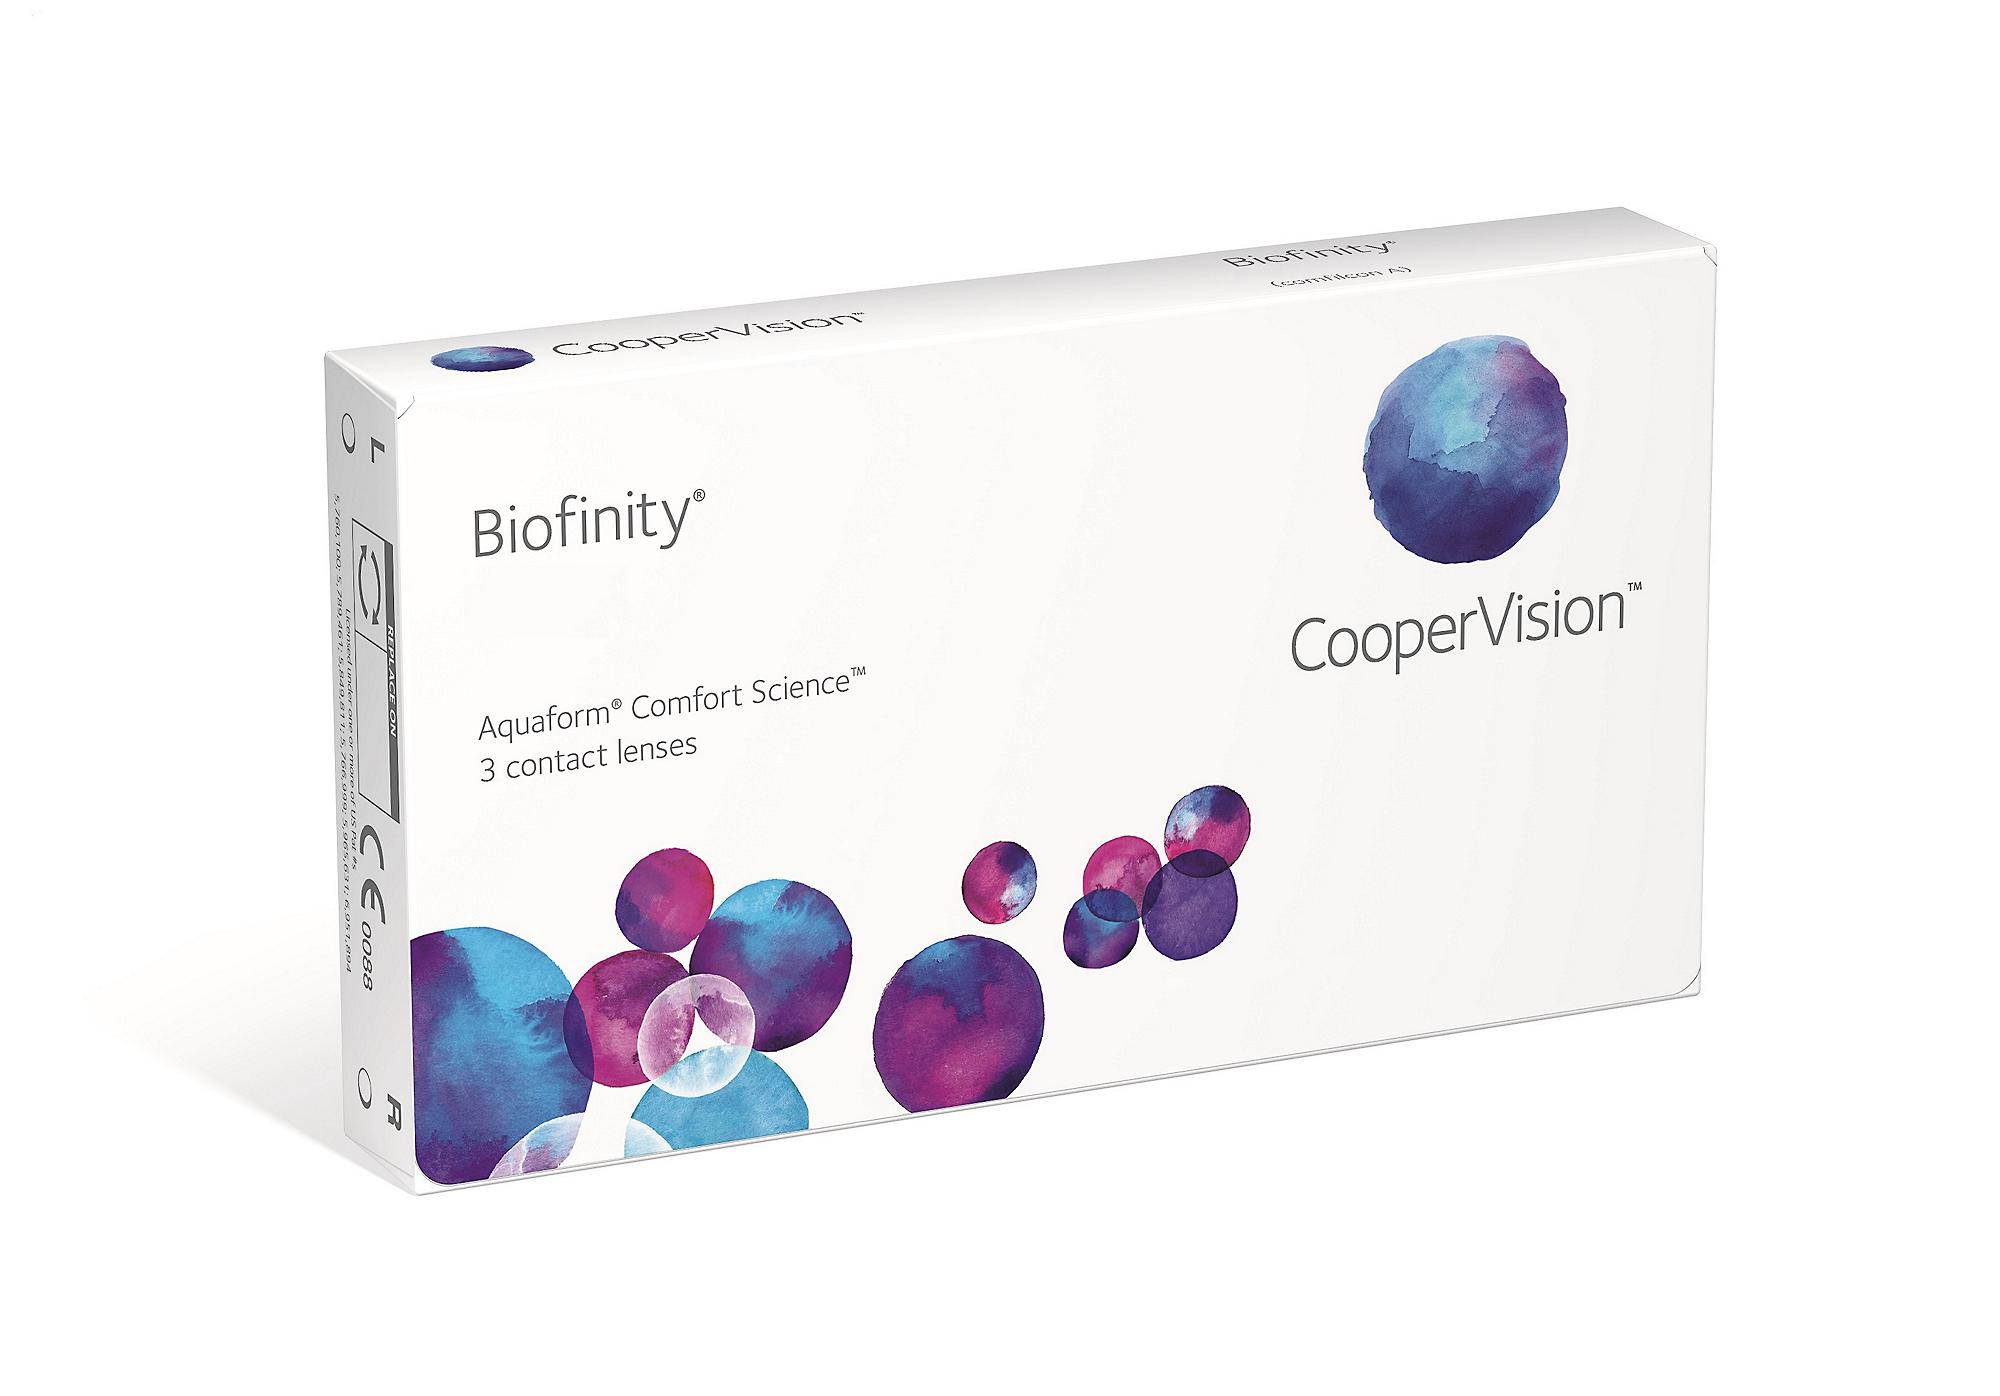 Biofinity with Aquaform